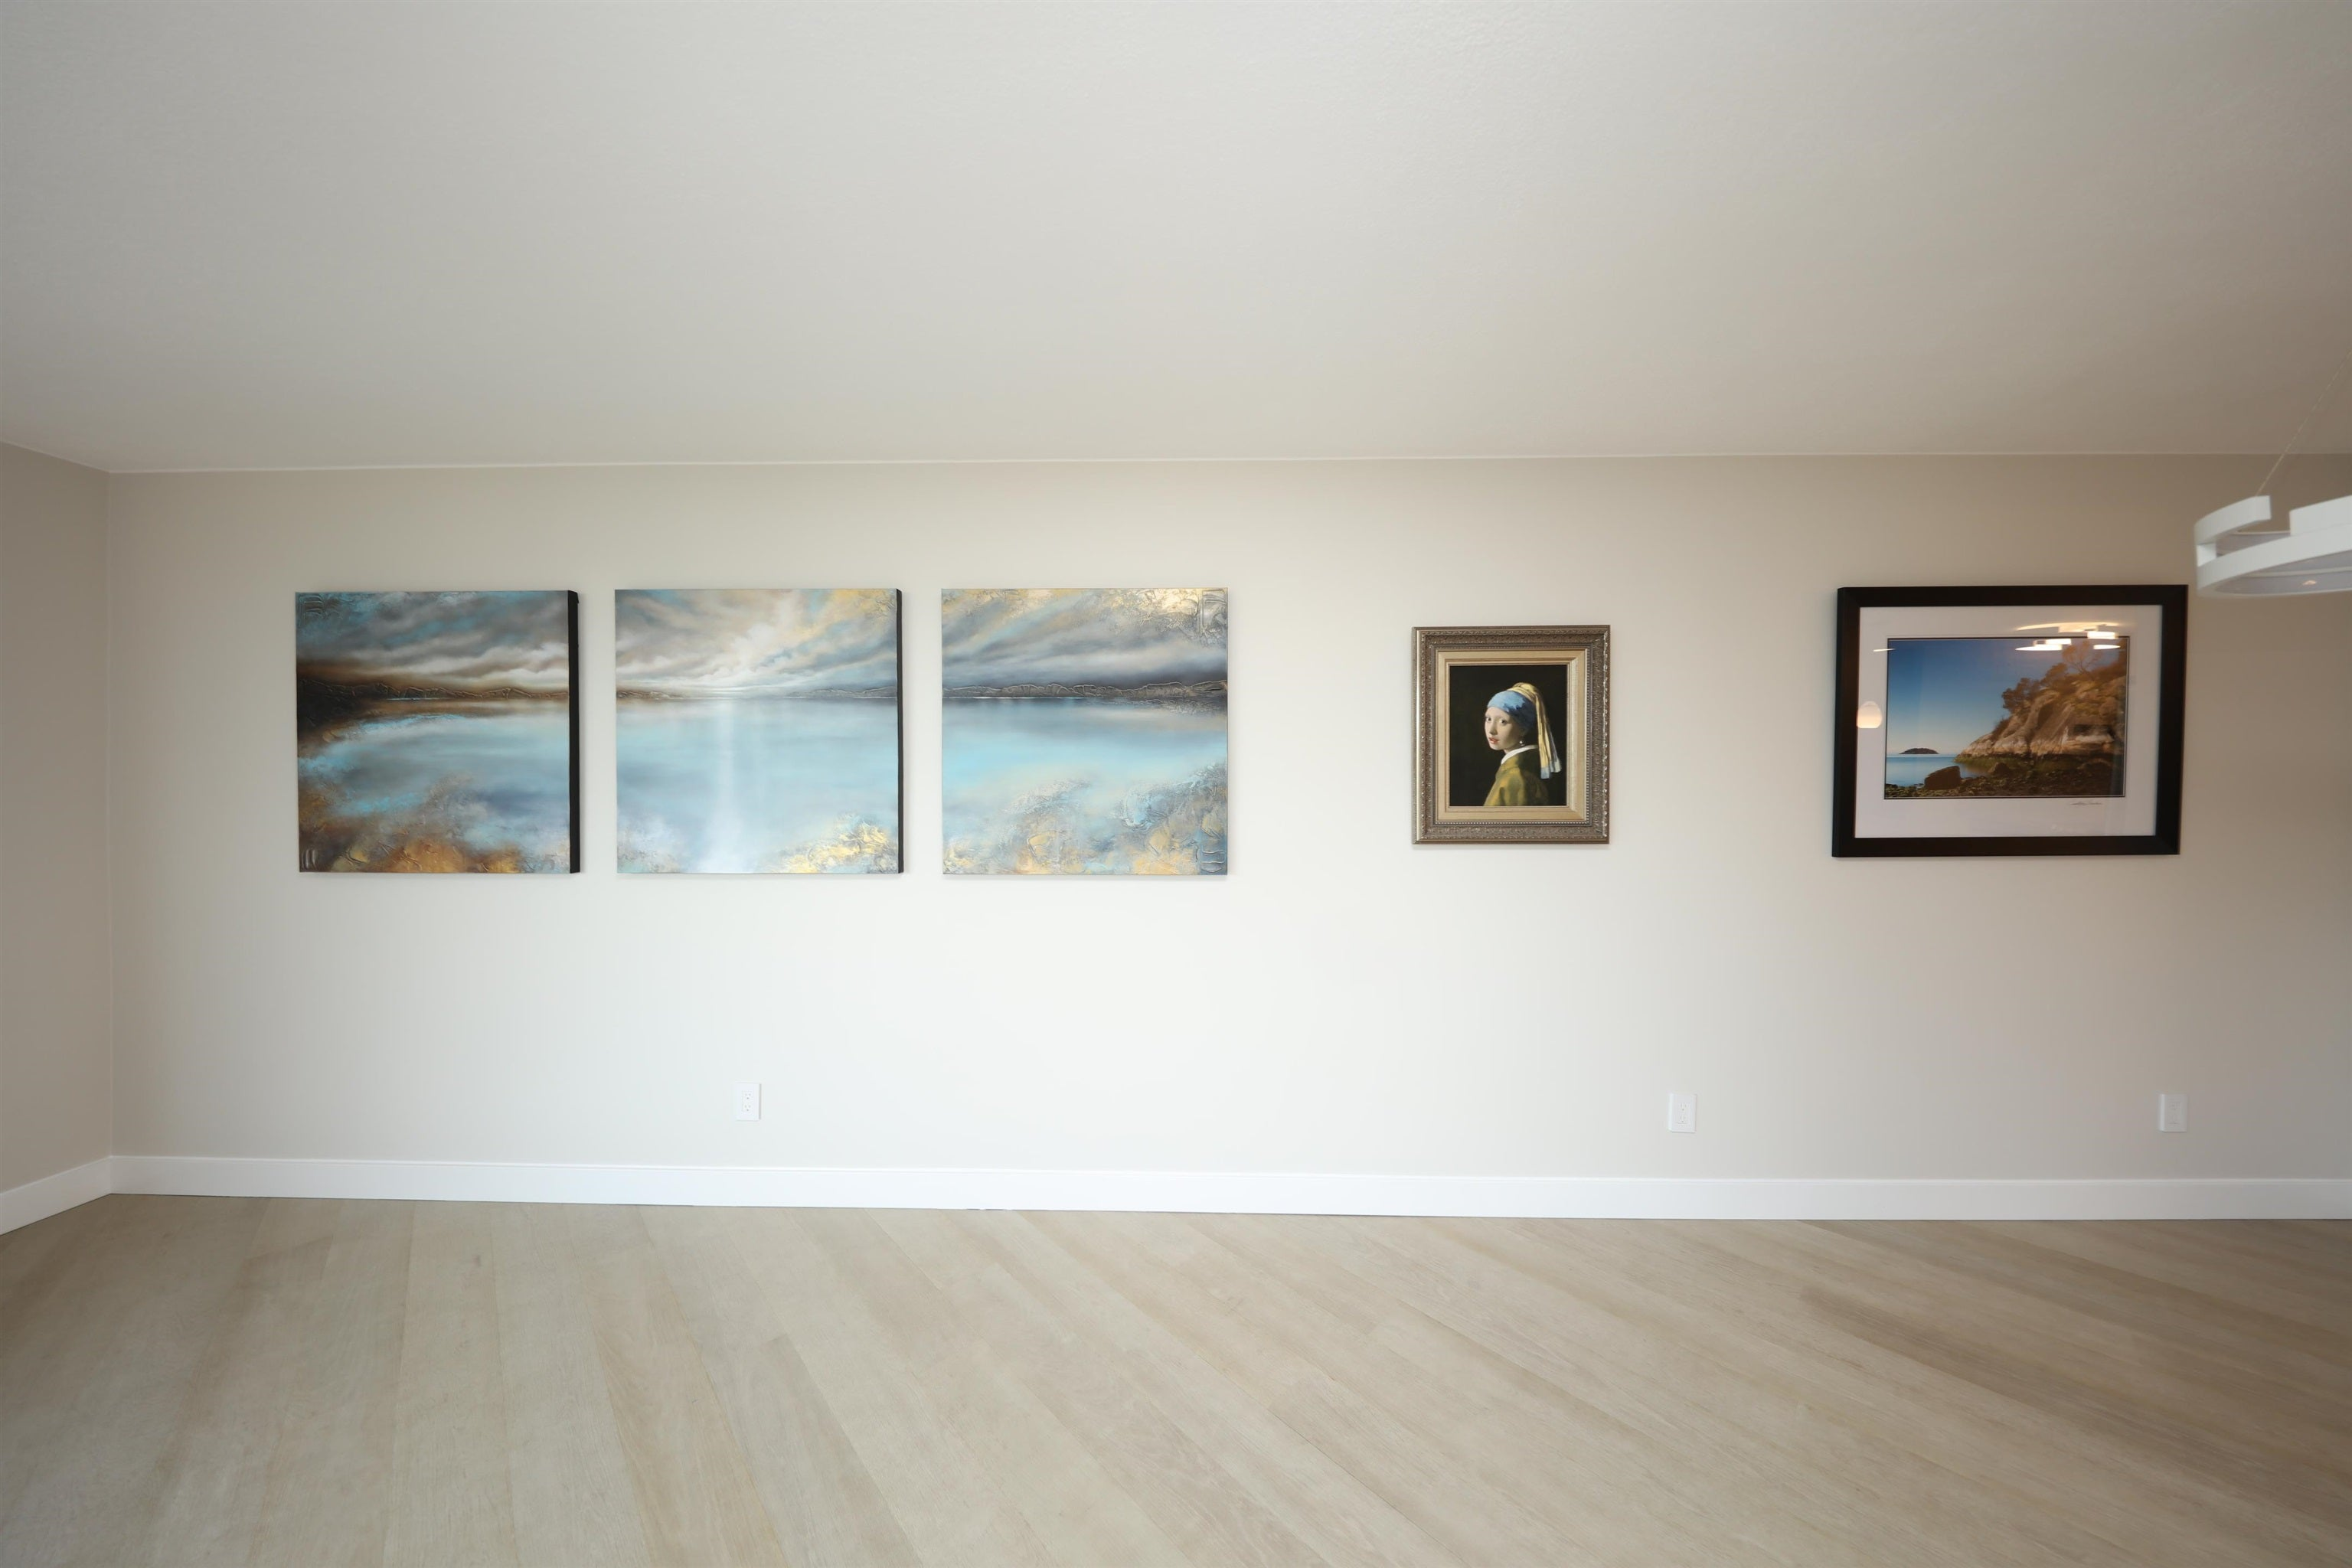 406 1450 PENNYFARTHING DRIVE - False Creek Apartment/Condo for sale, 2 Bedrooms (R2617259) - #31